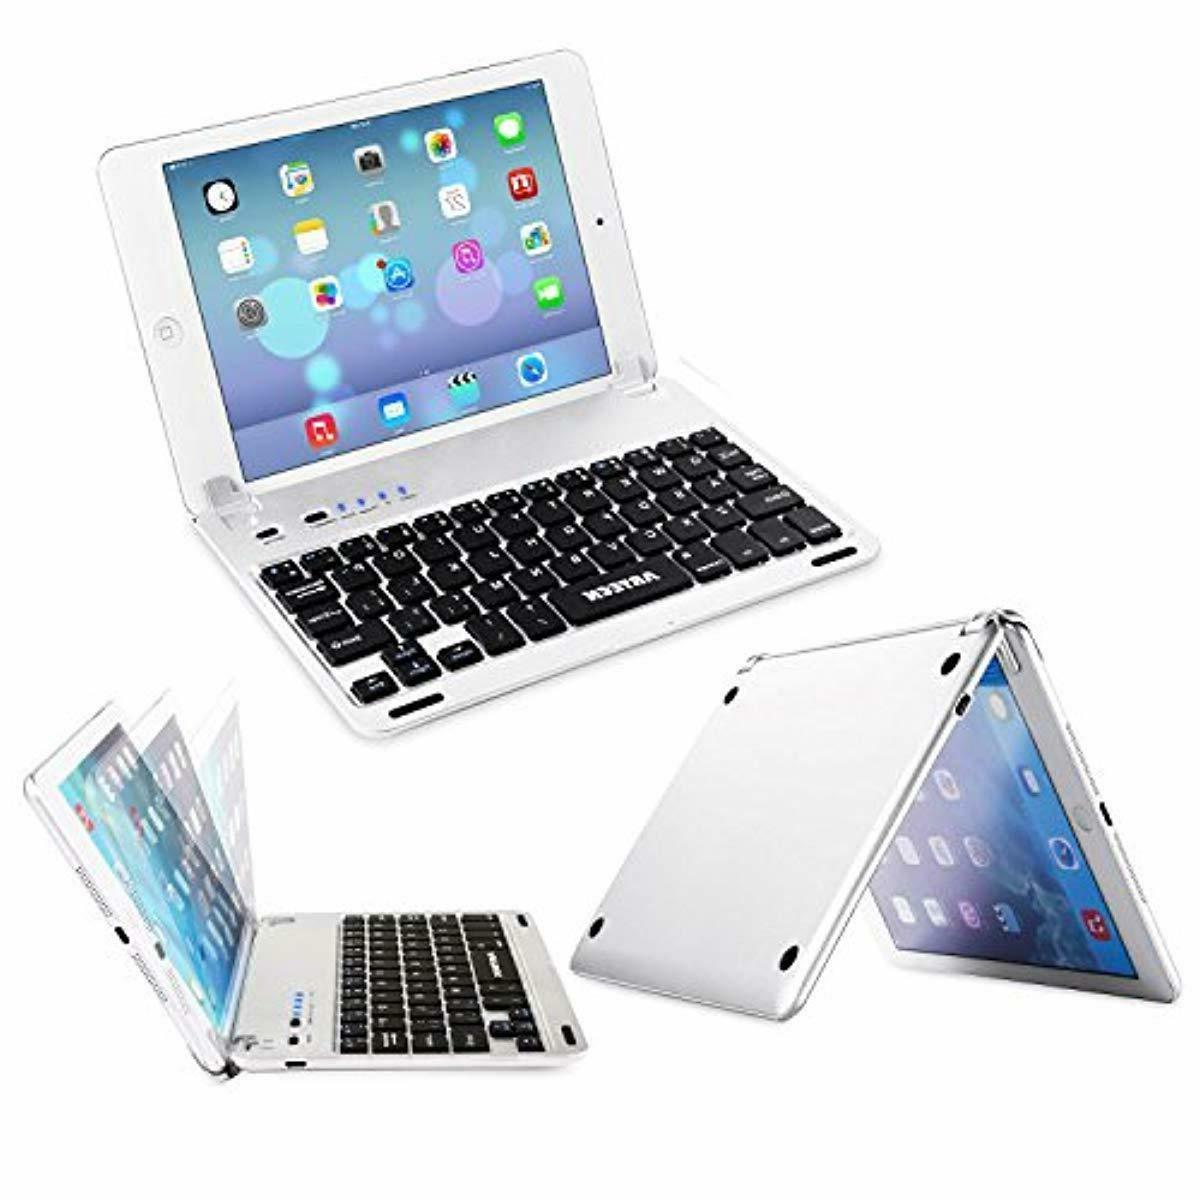 iPad 5 Mini Keyboard, Ultra-Thin Apple iPad Bluetooth Keybo